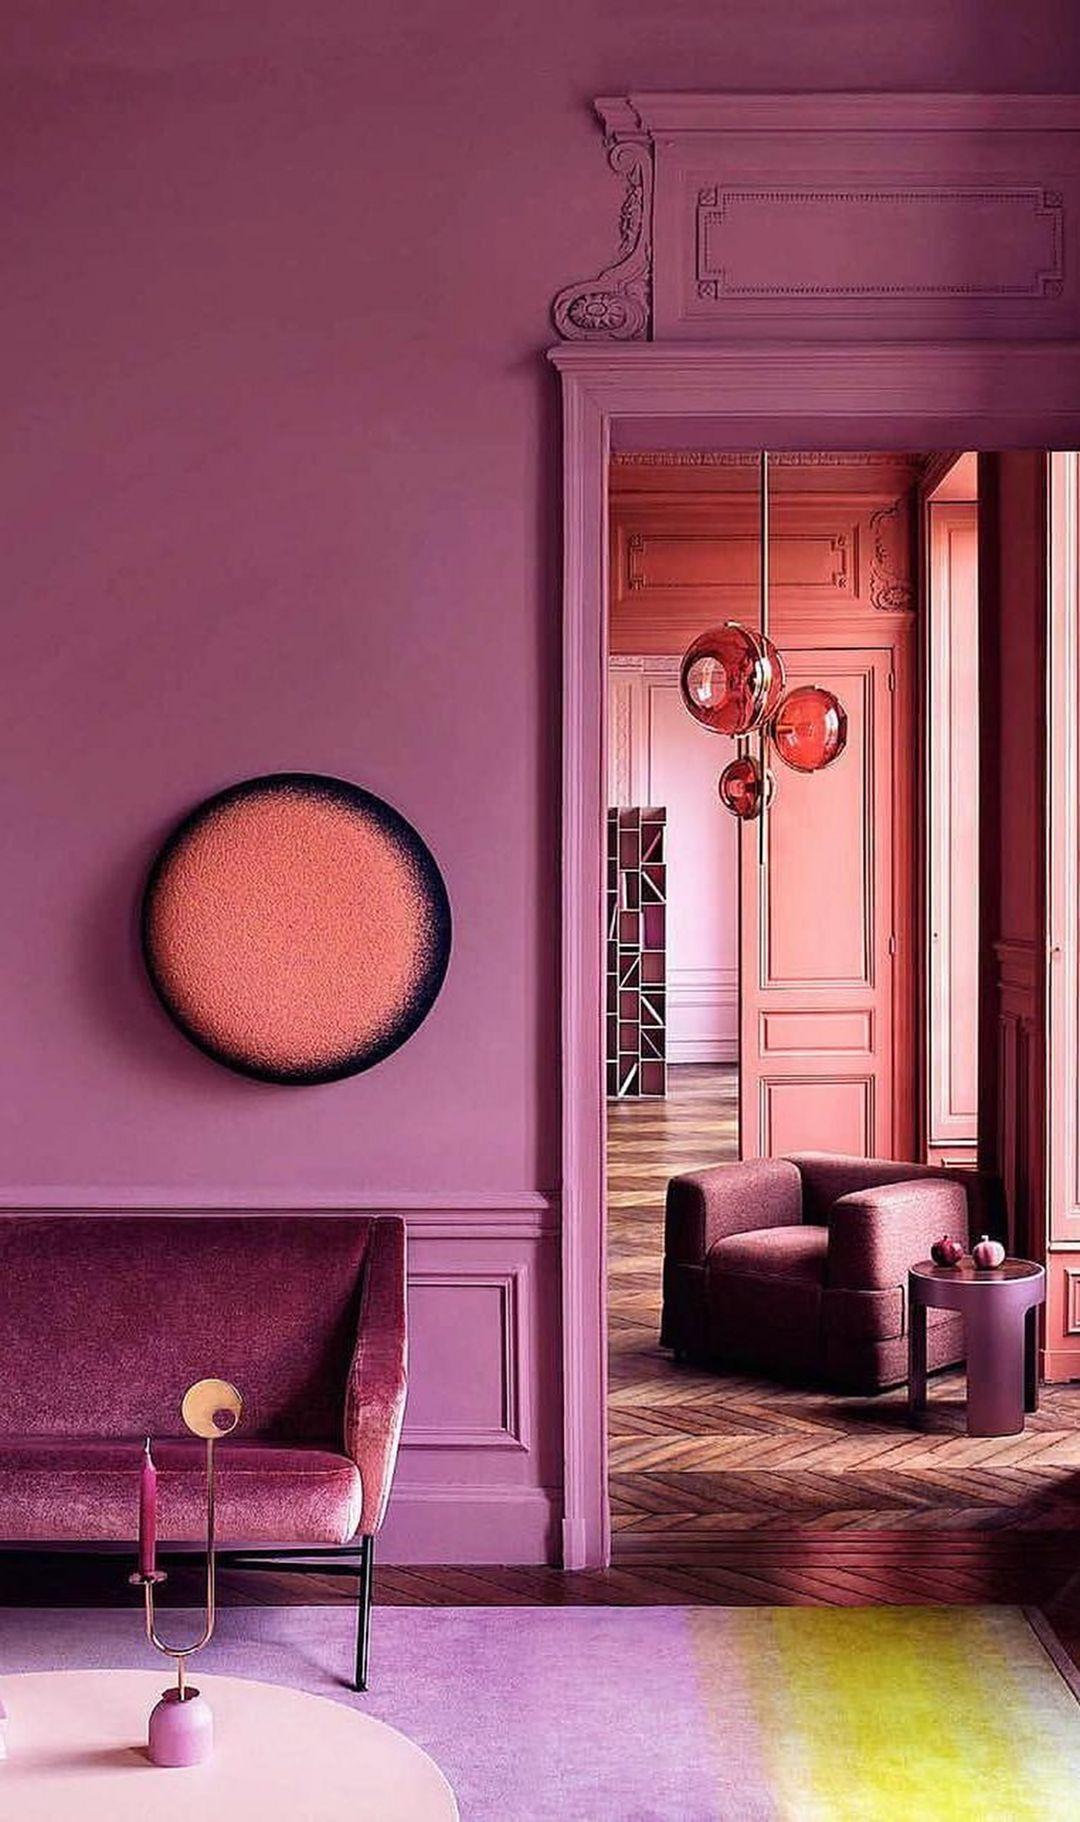 20 color harmony interior design ideas for cool home on home interior design ideas id=69121